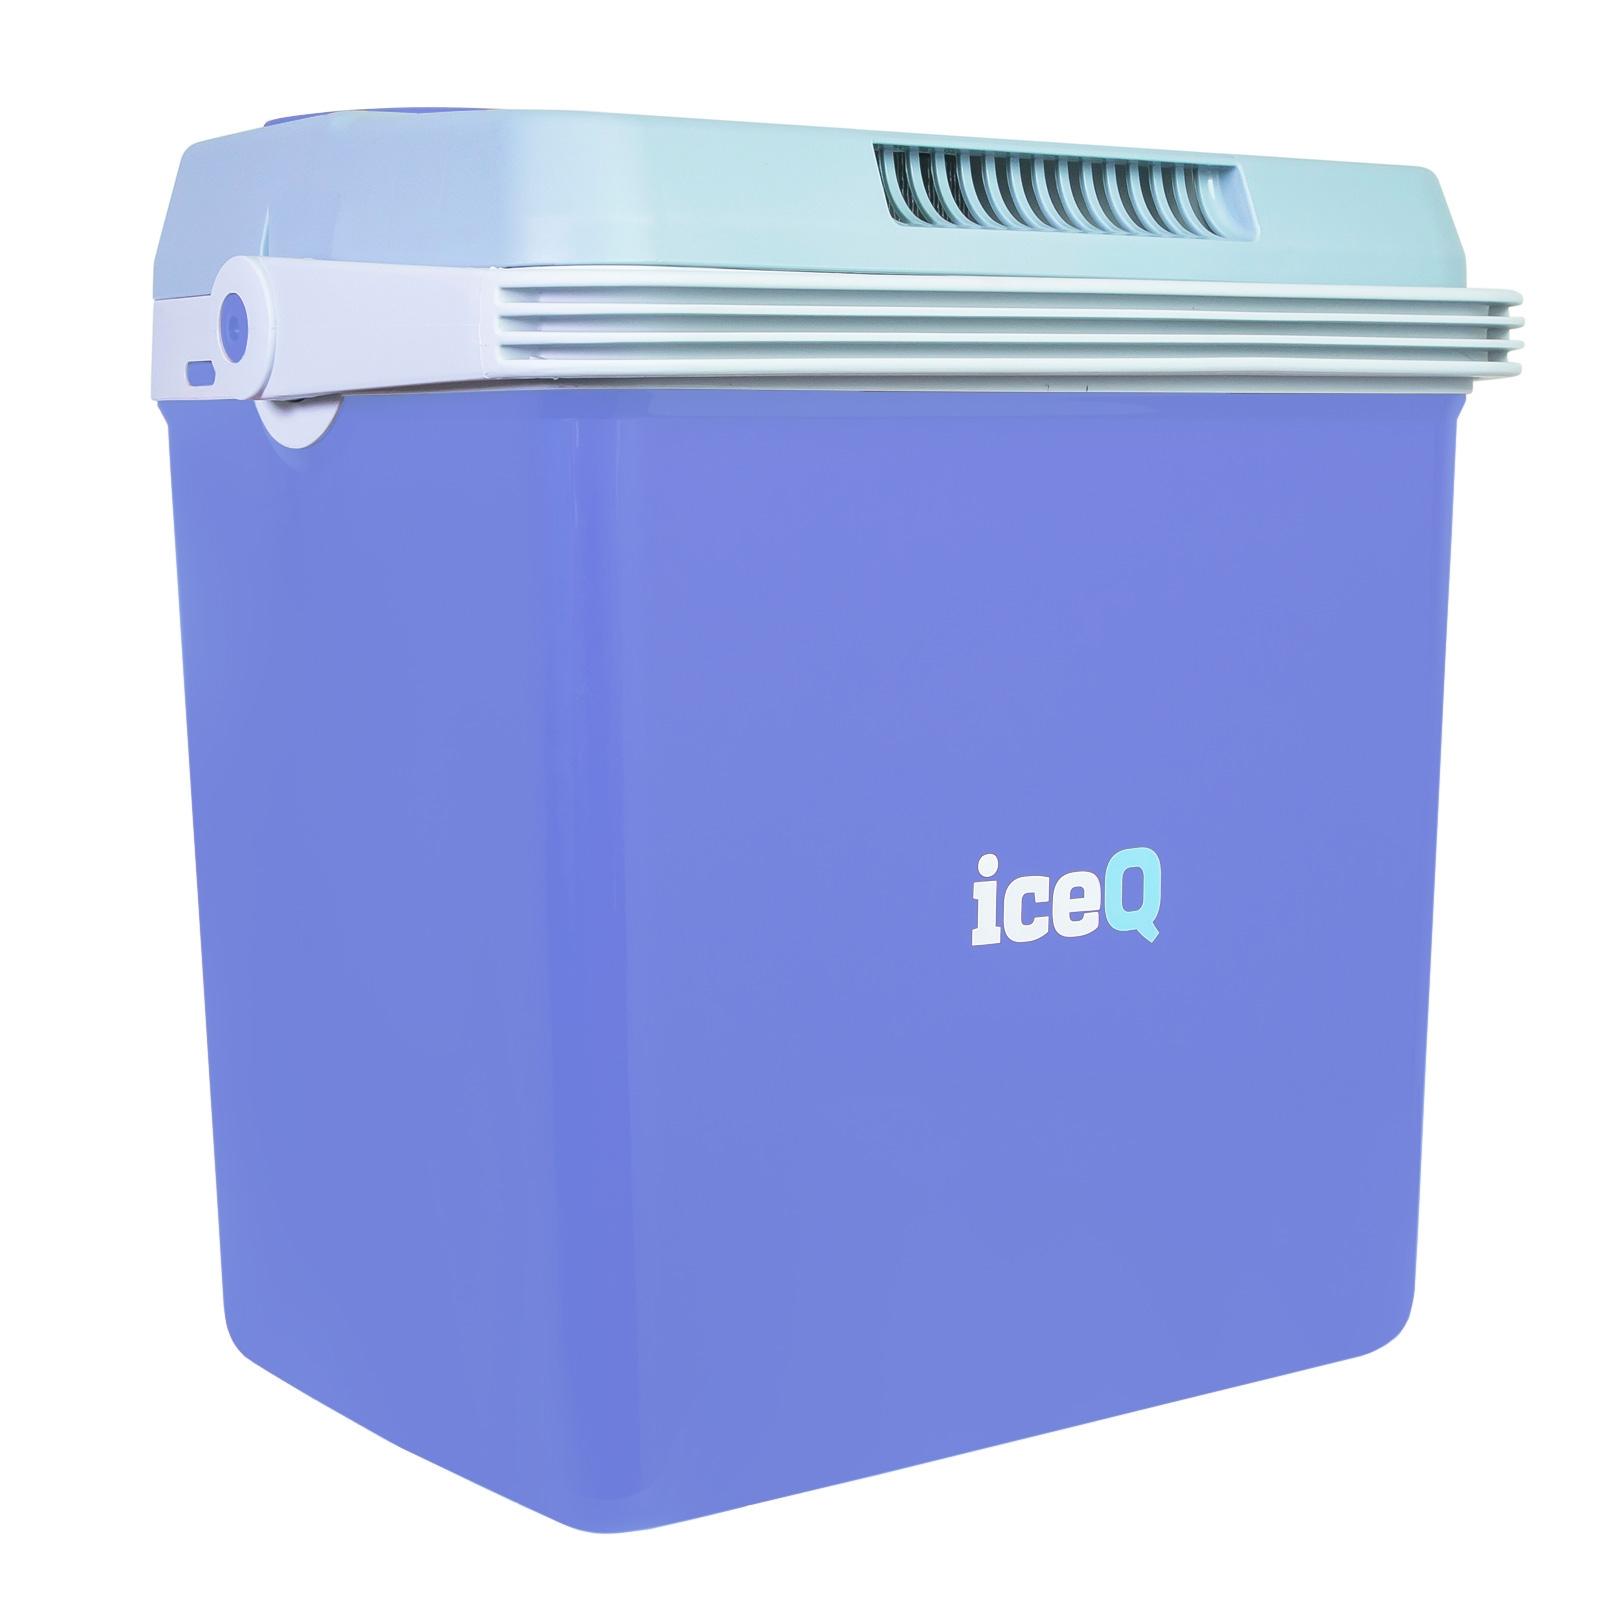 Iceq 32 Litre Electric Cool Box Blue